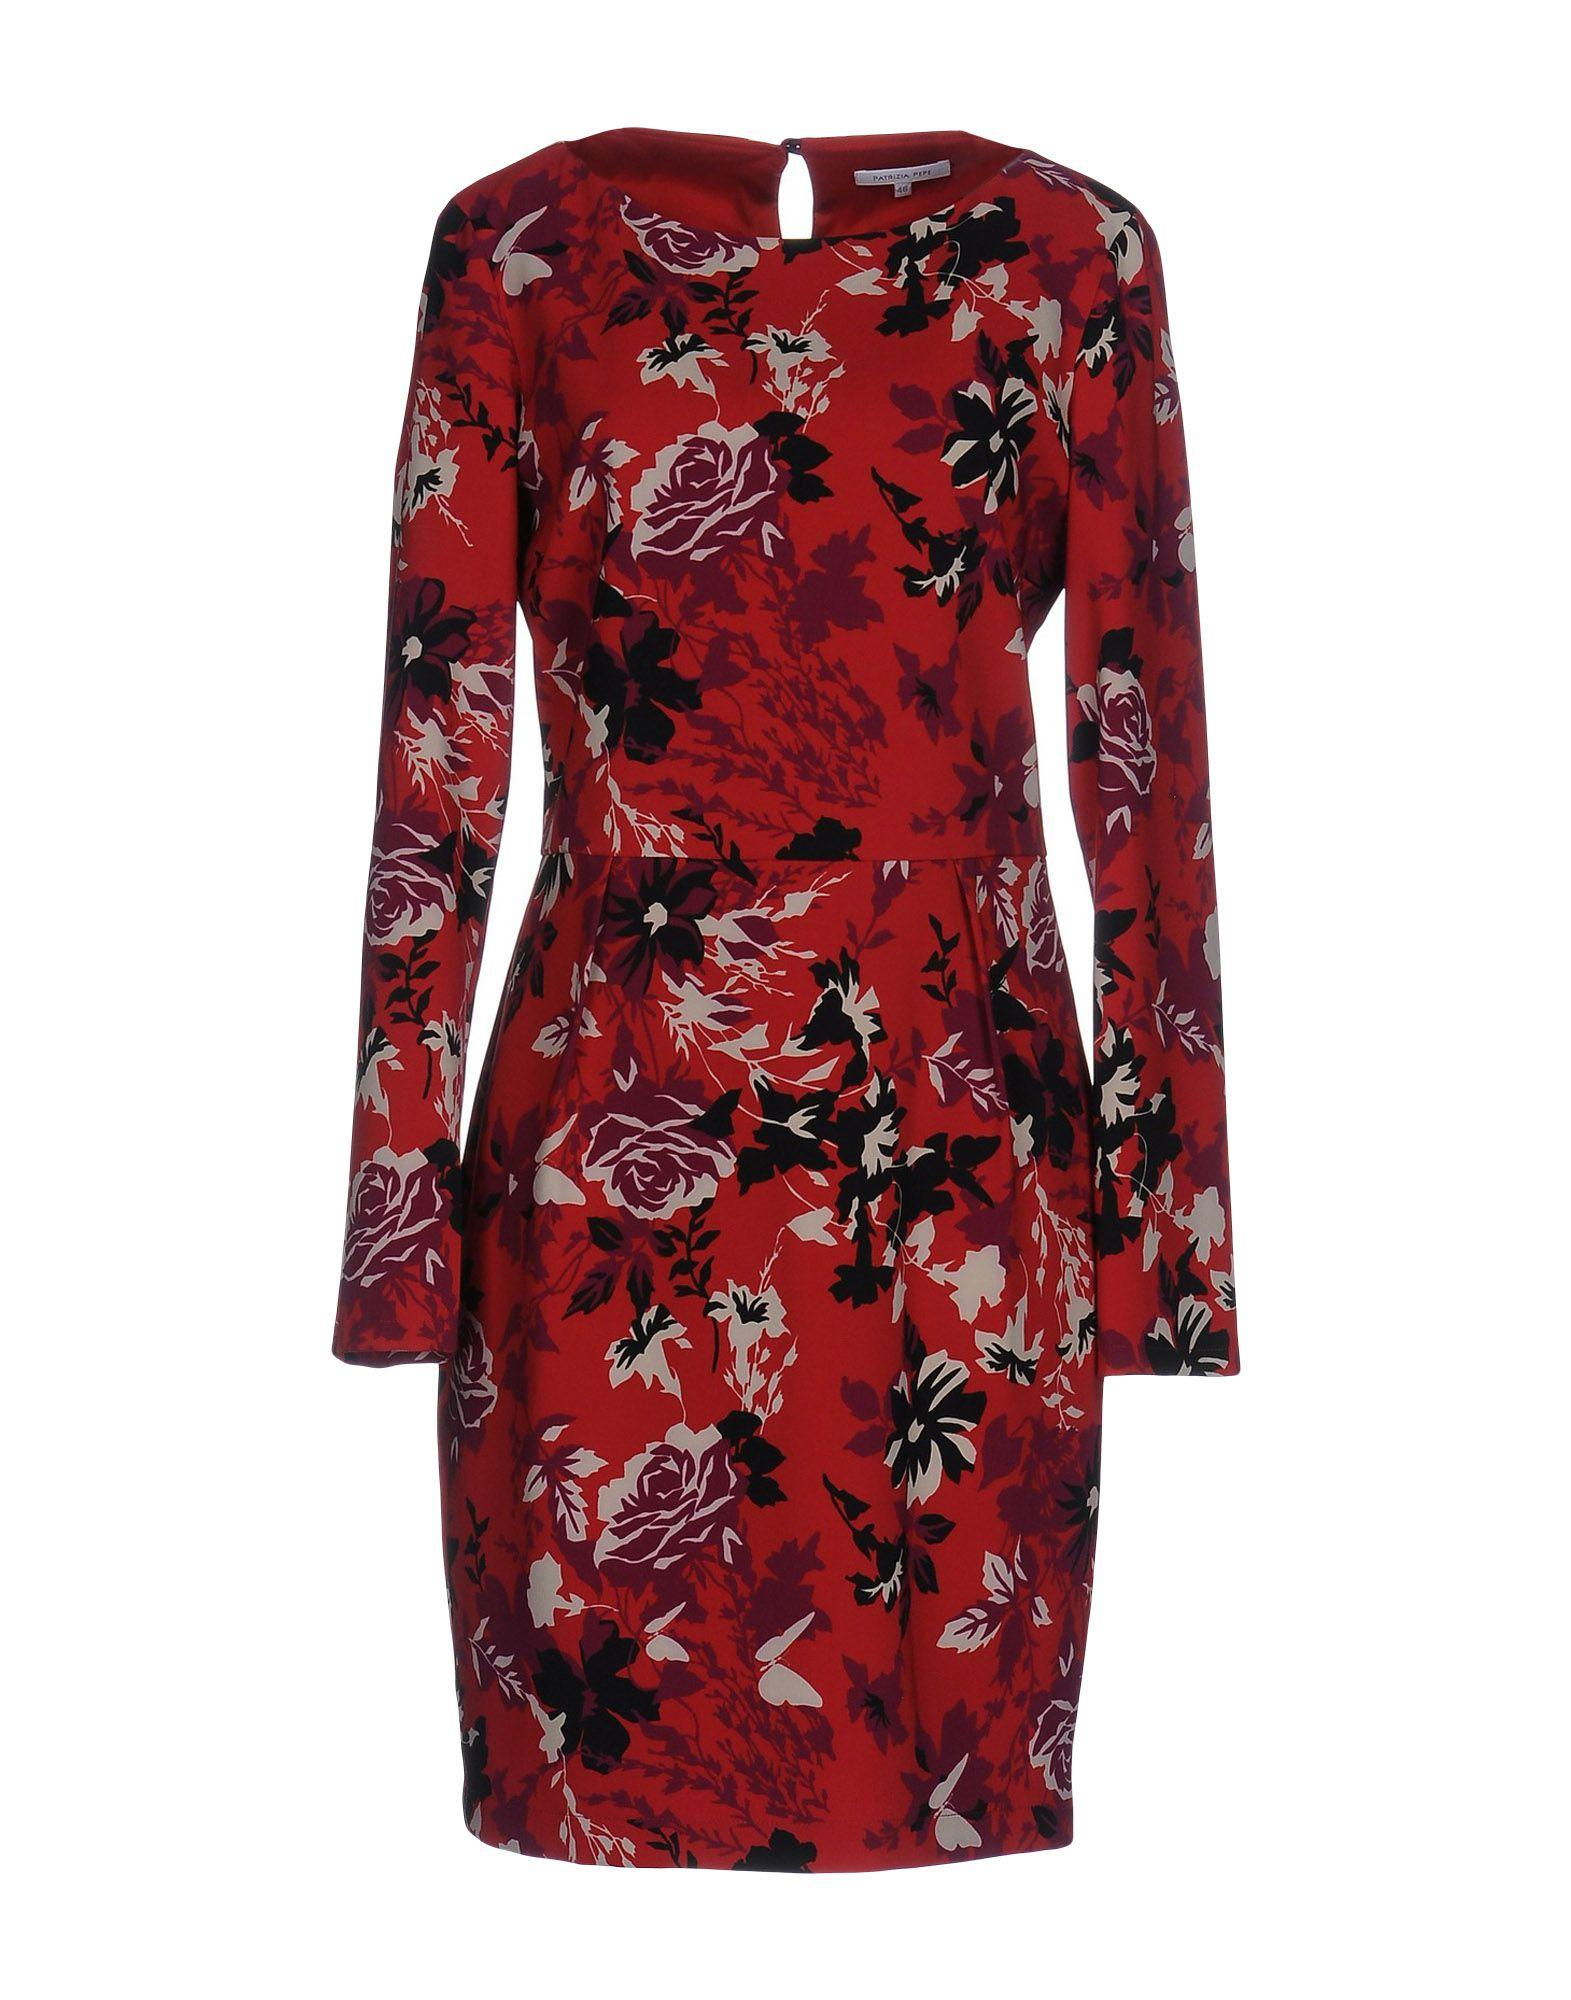 Patrizia Pepe Short Dress In Red